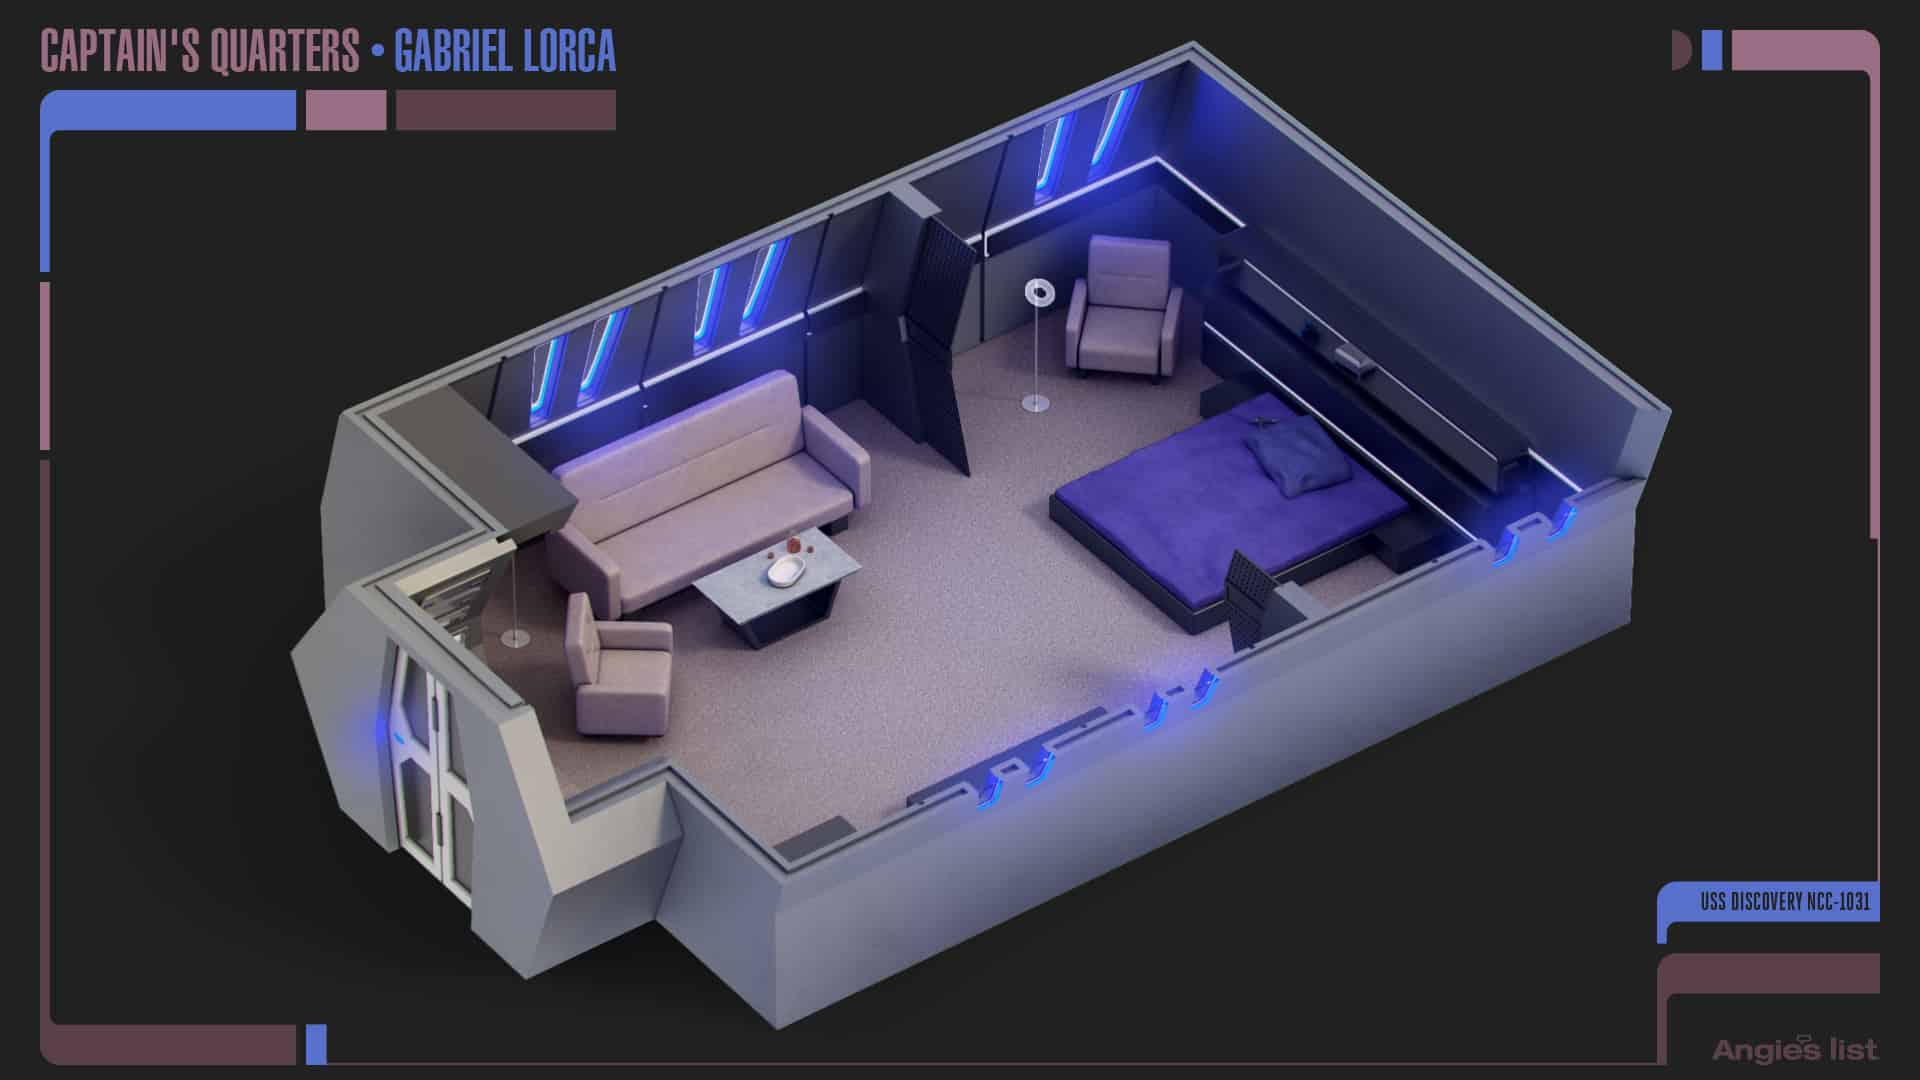 6 Gabriel Lorca quarters